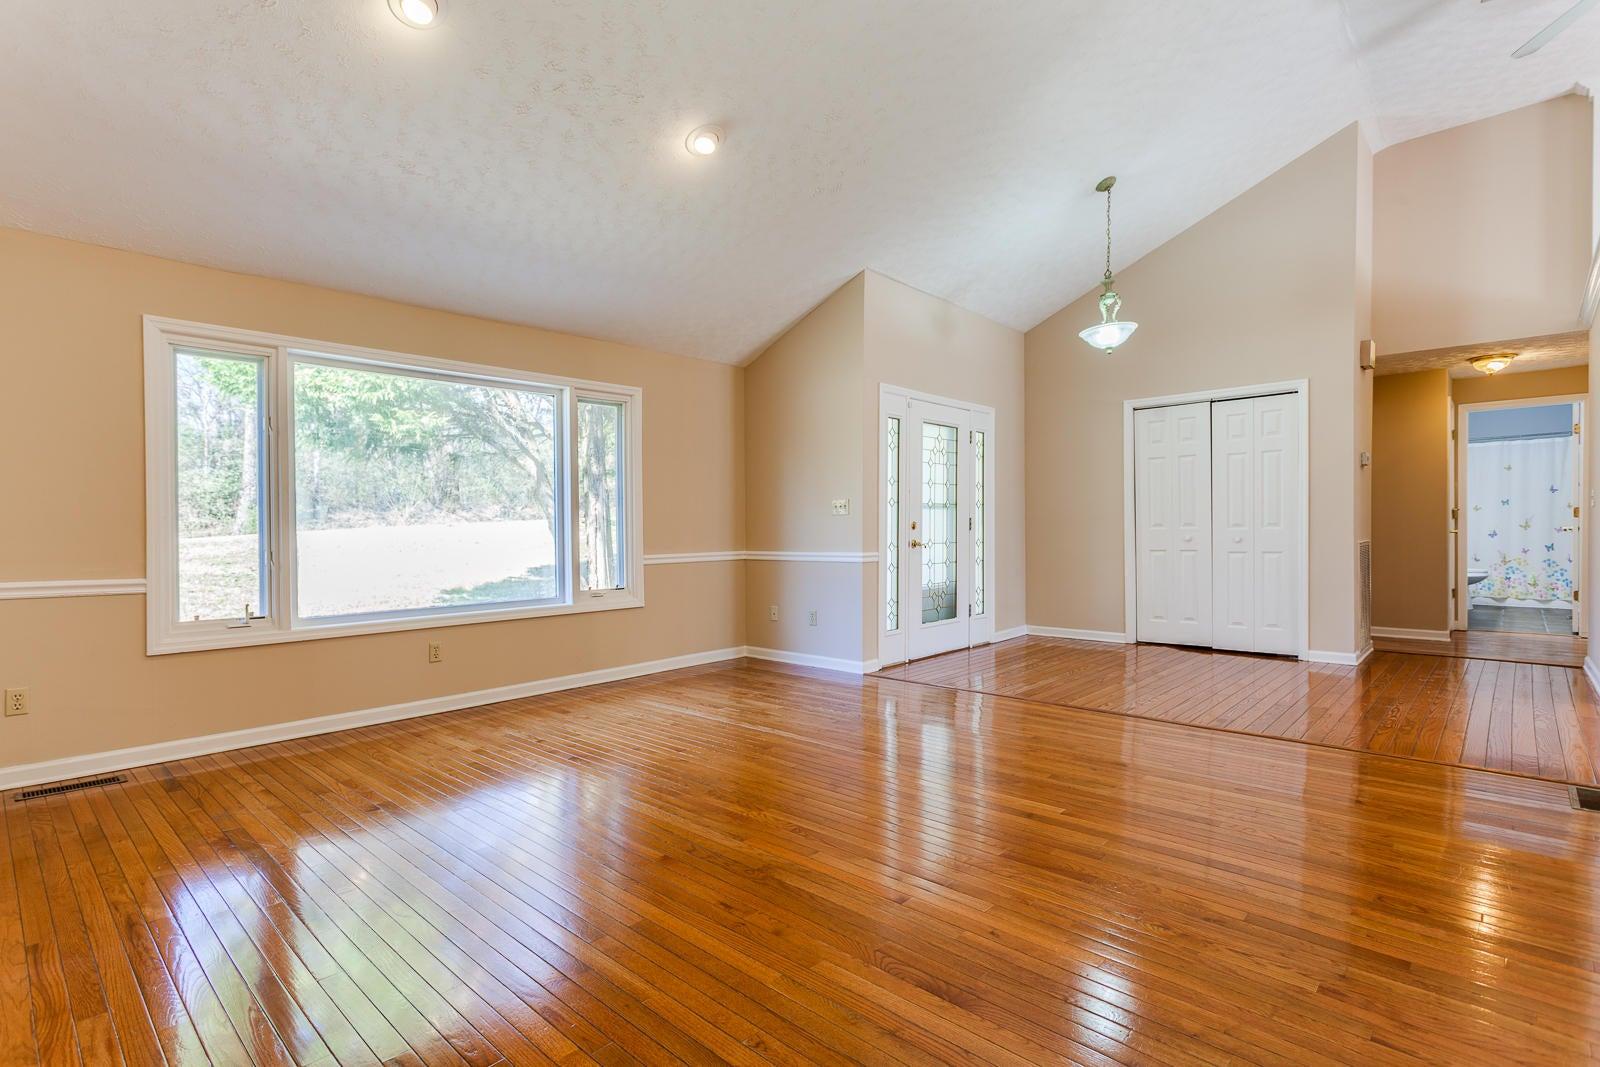 03 Living Room